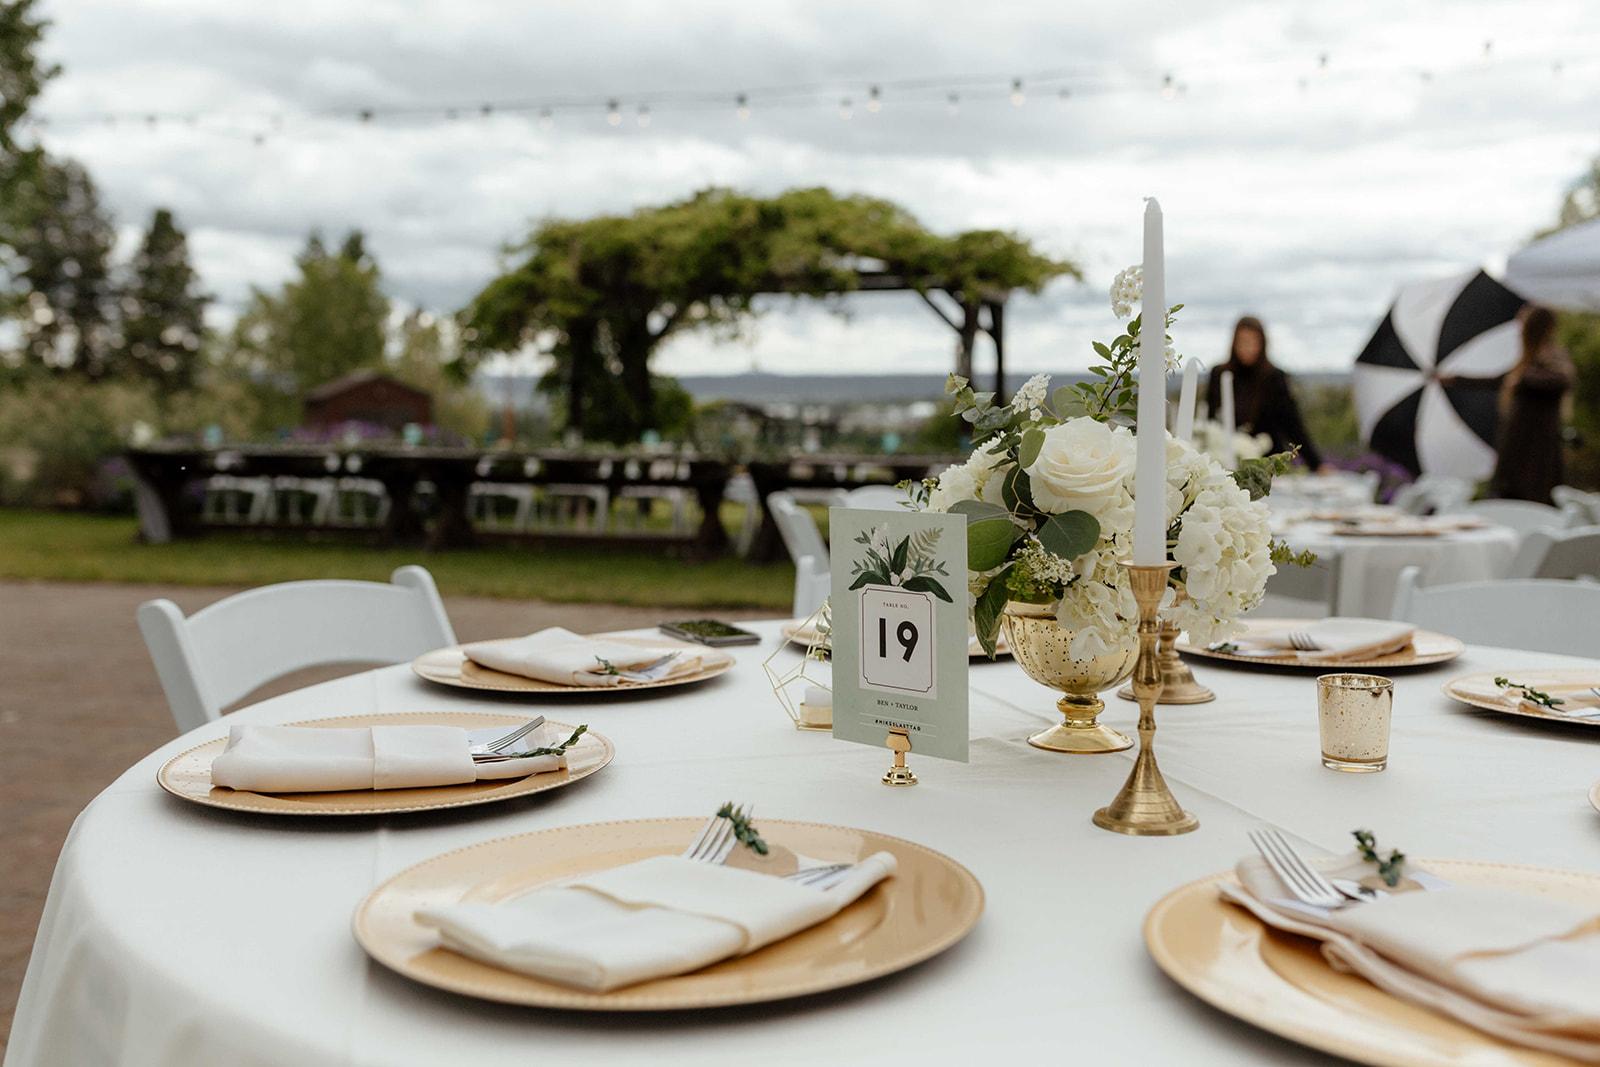 beacon hill wedding honest in ivory dress spokane table setting